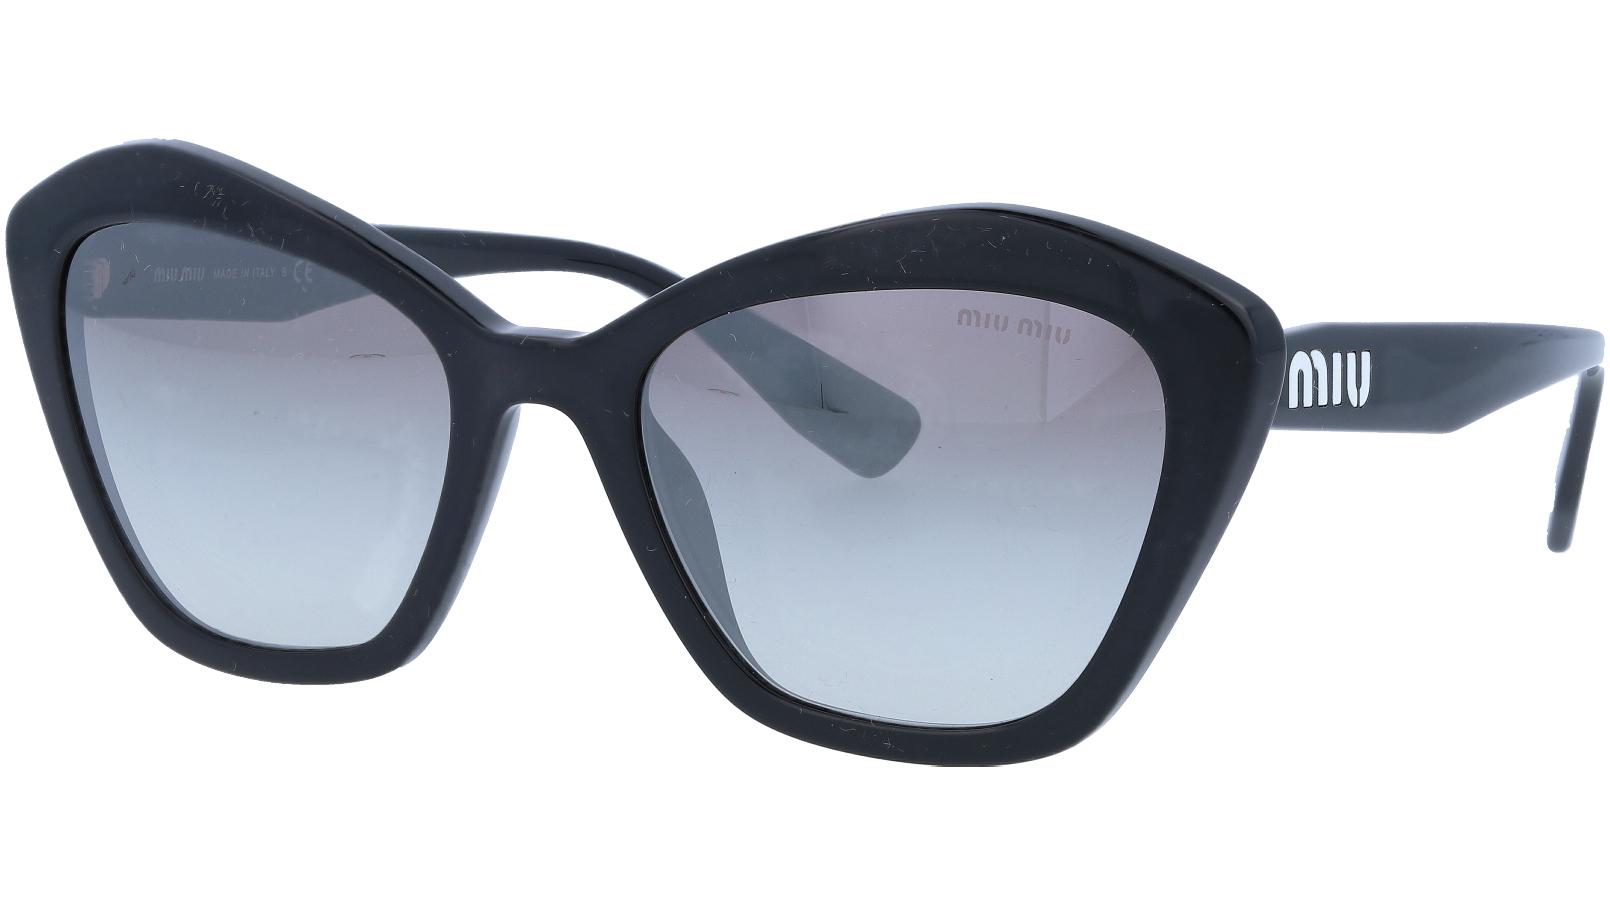 Miu Miu MU05US 1AB5O0 55 Black Cat-Eye Sunglasses